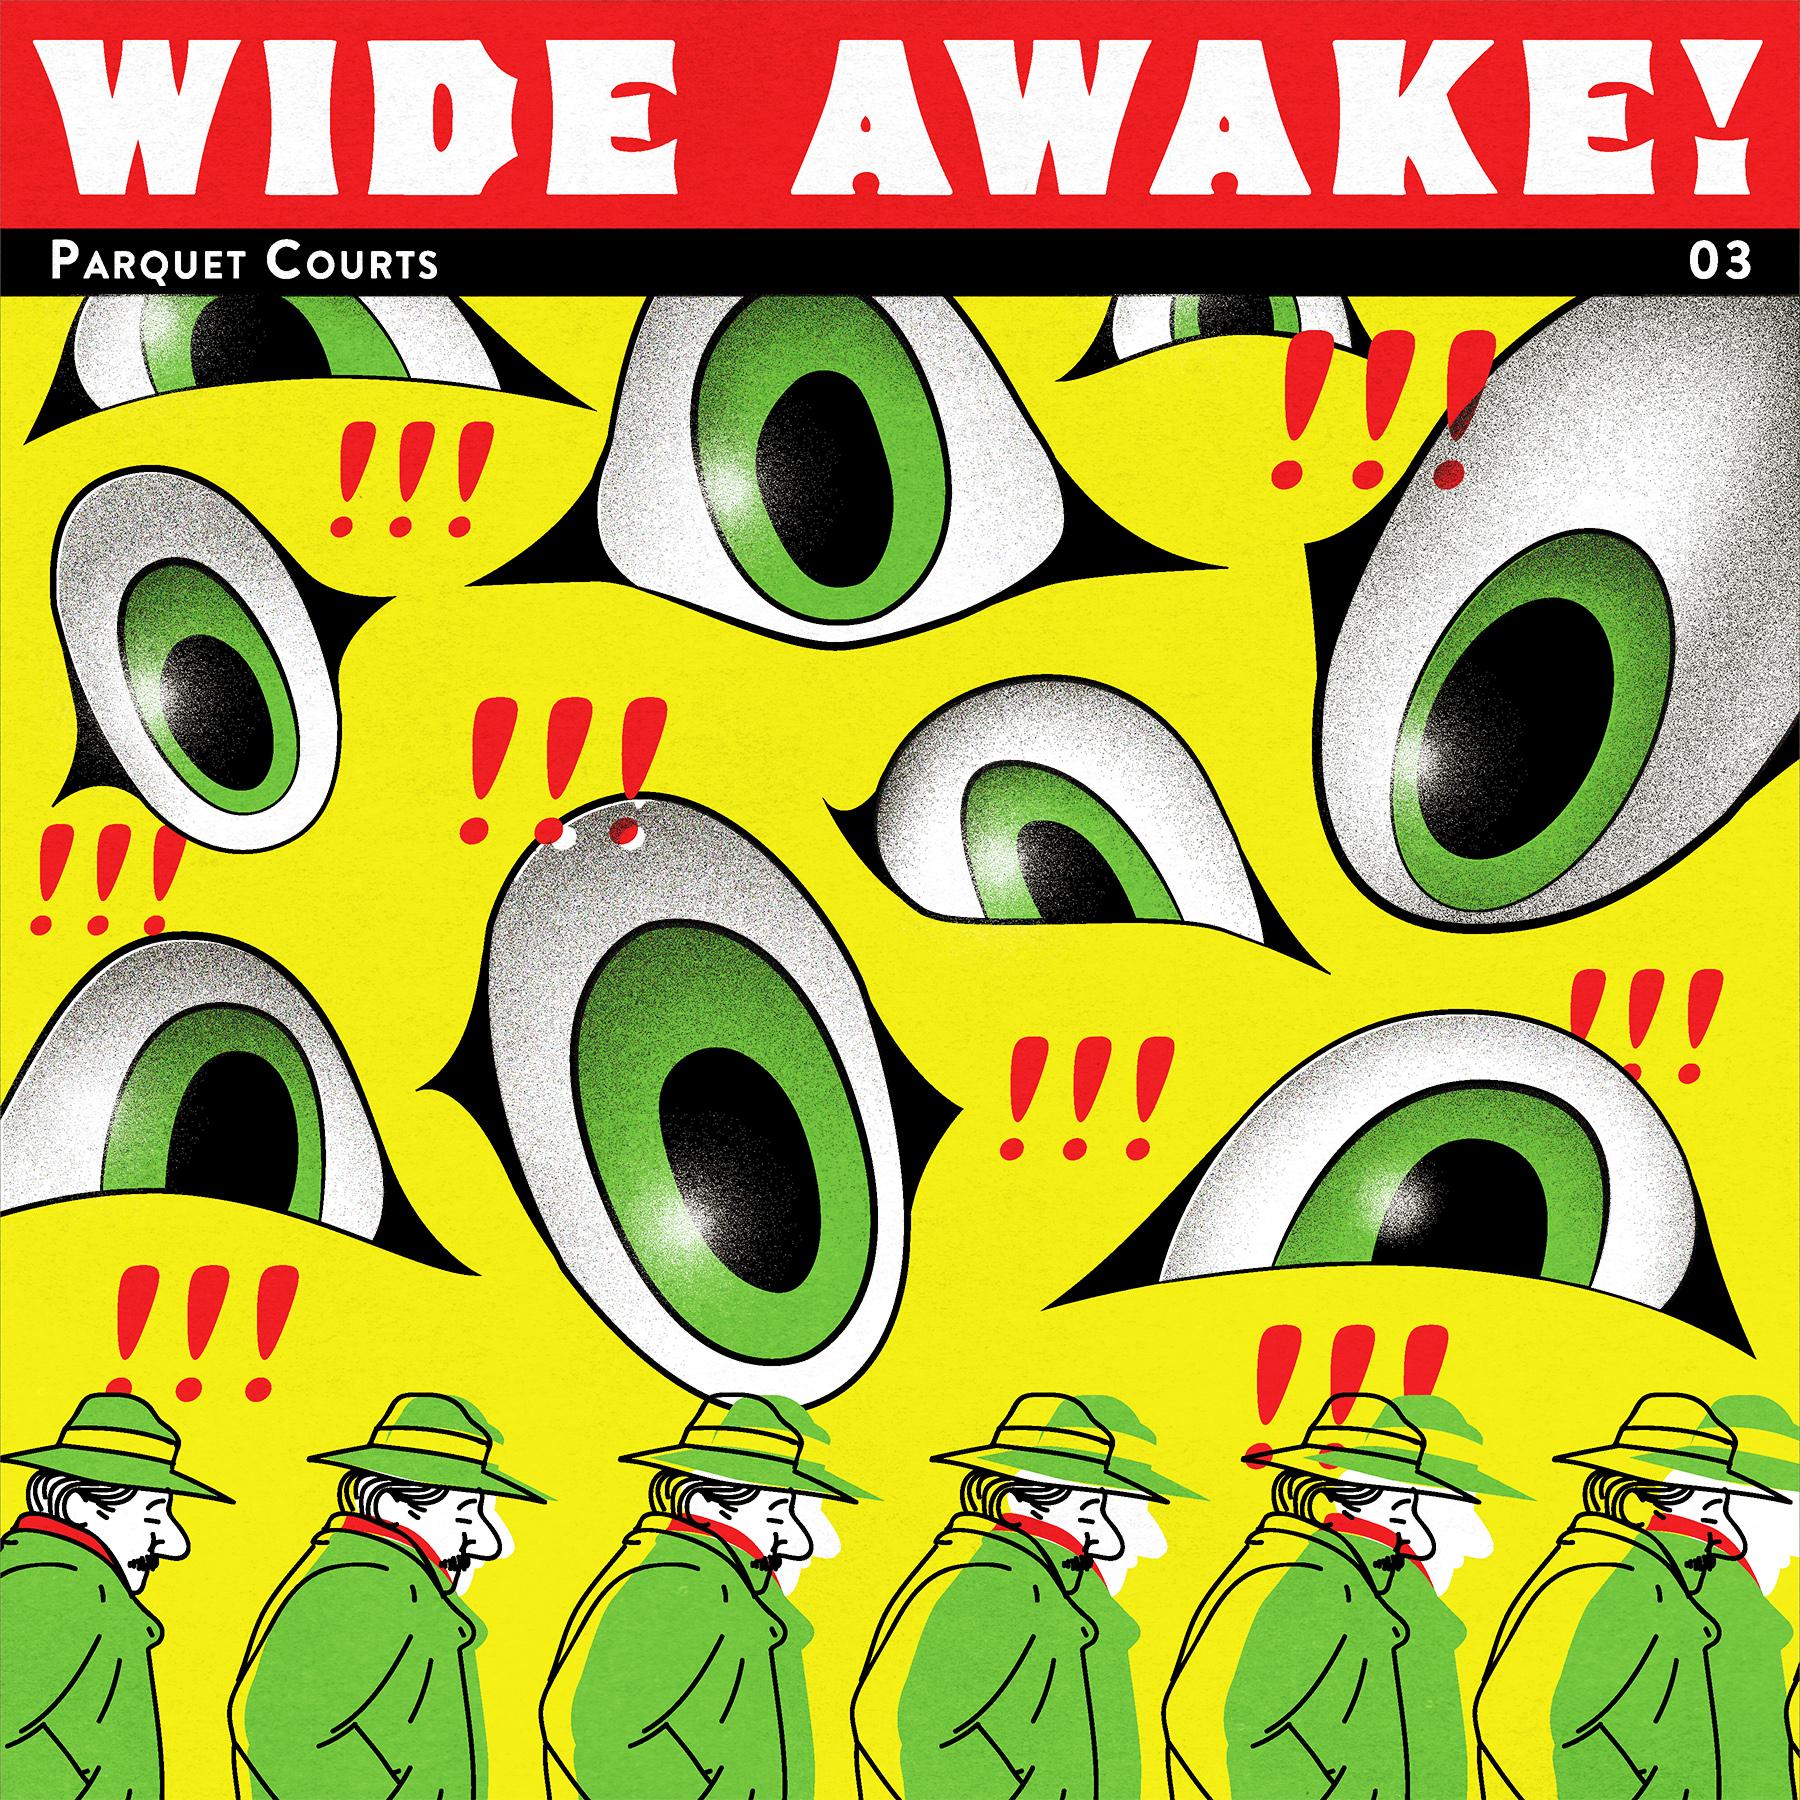 Wide Awake! by Parquet Courts